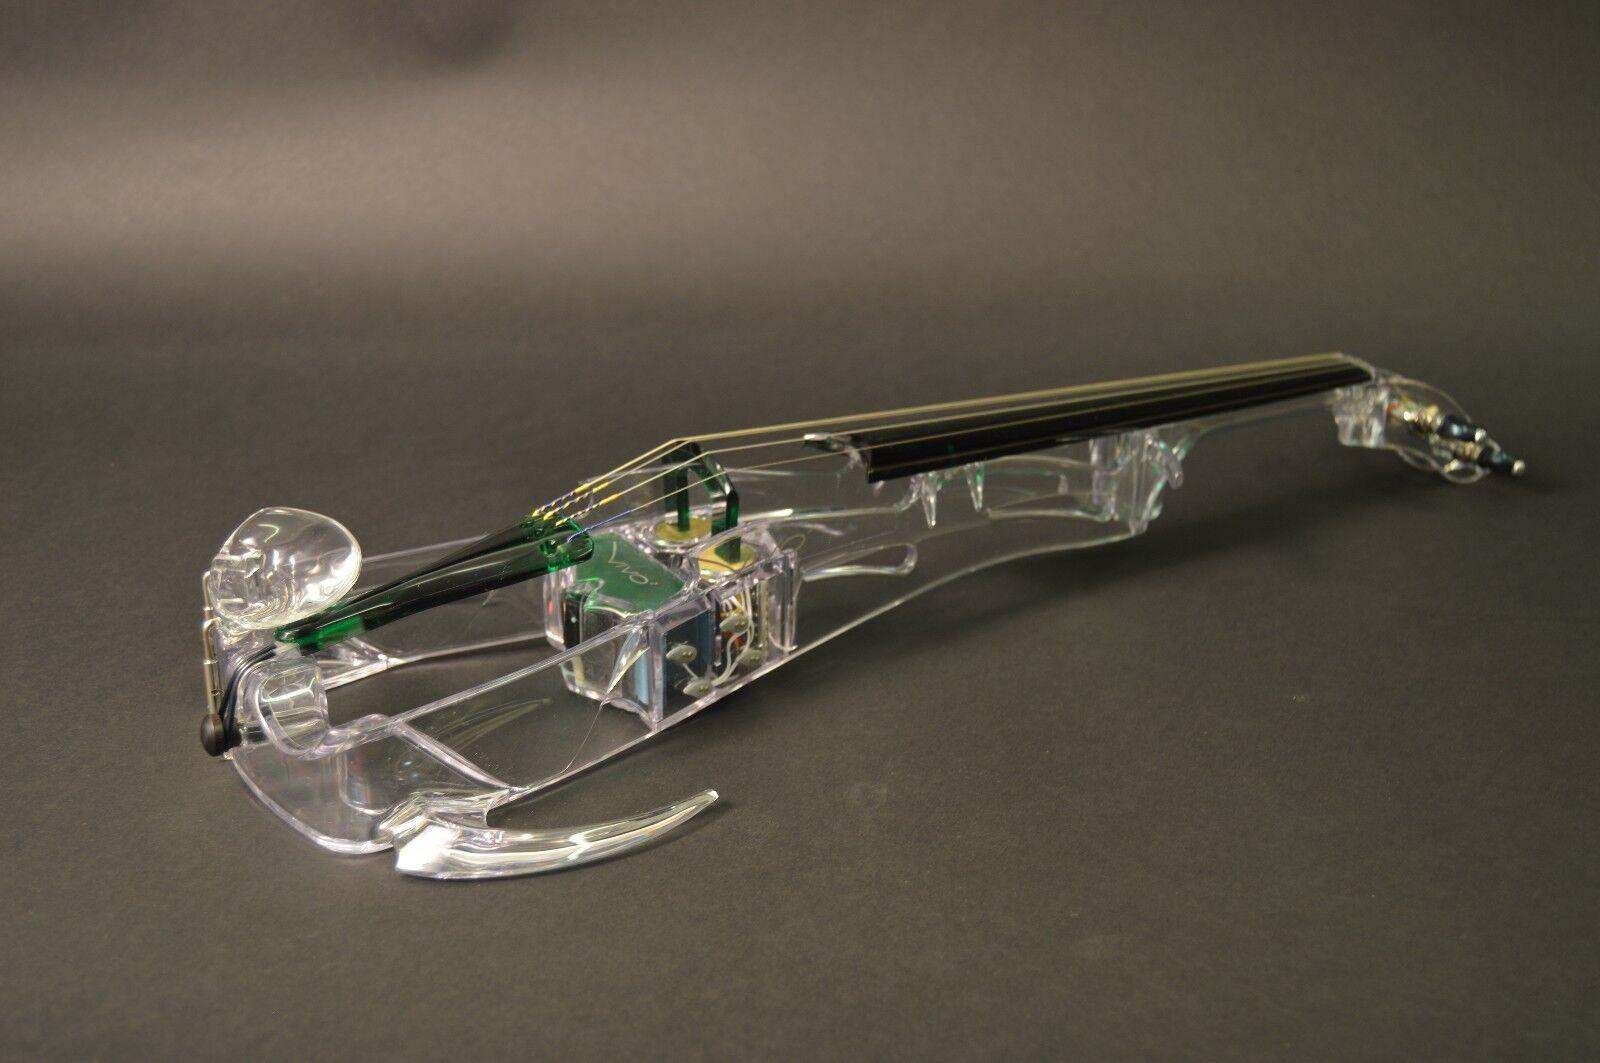 Ted Brewer Electric Violin Vivo2 Grün 4 String